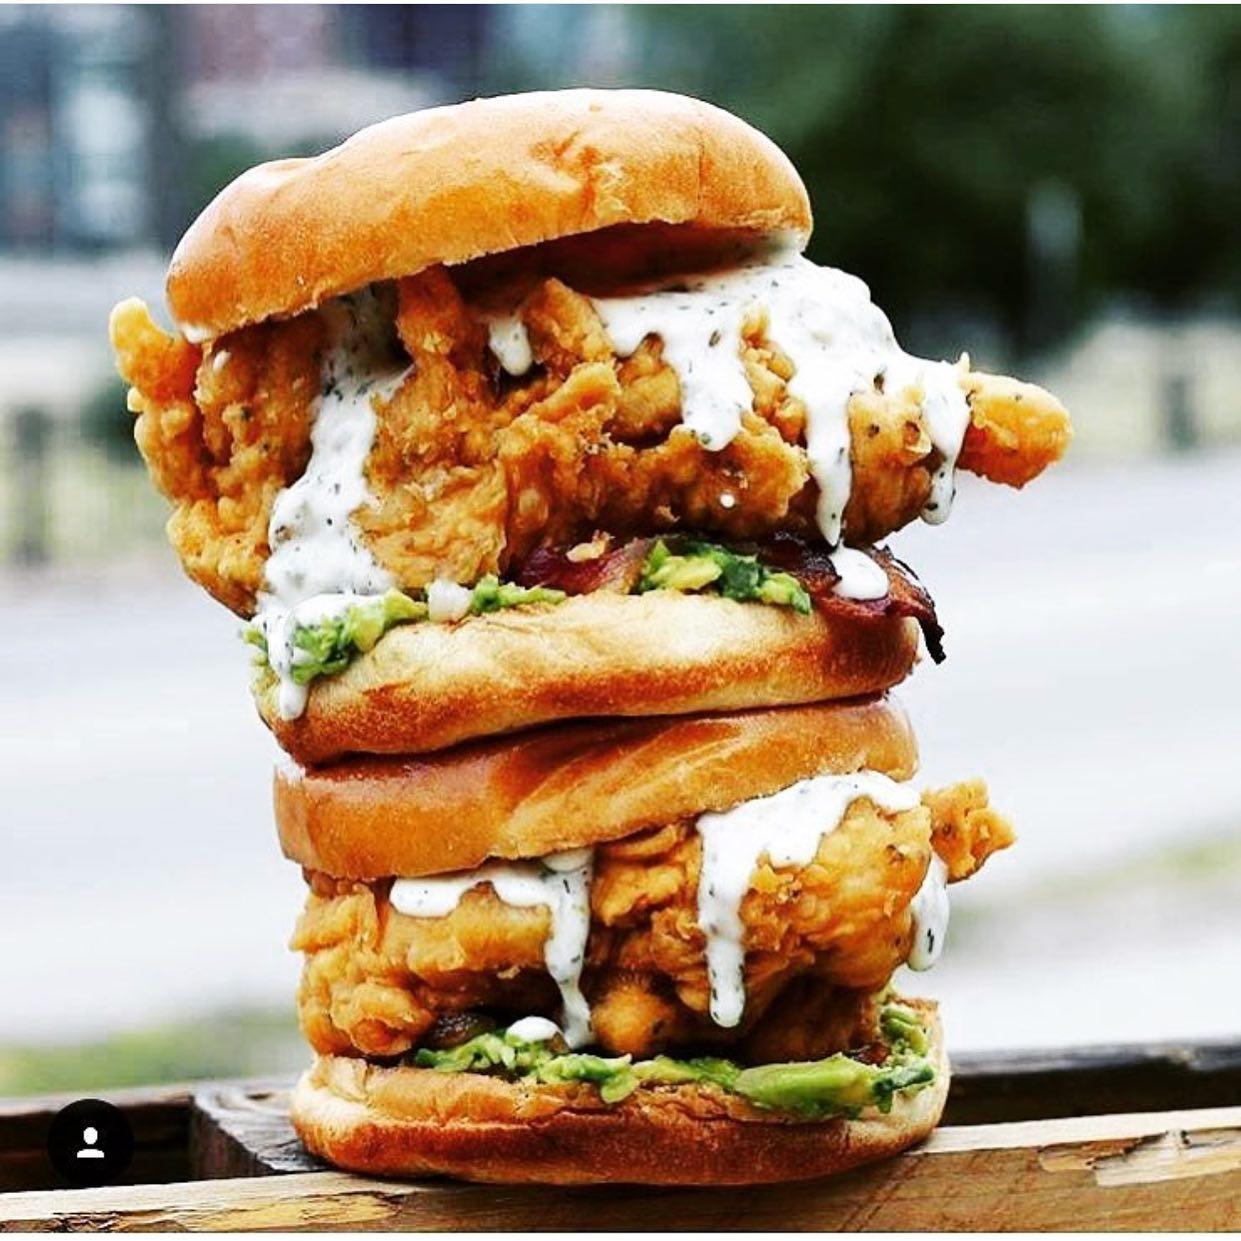 Fried Chicken Lands at Avanti Food & Beverage